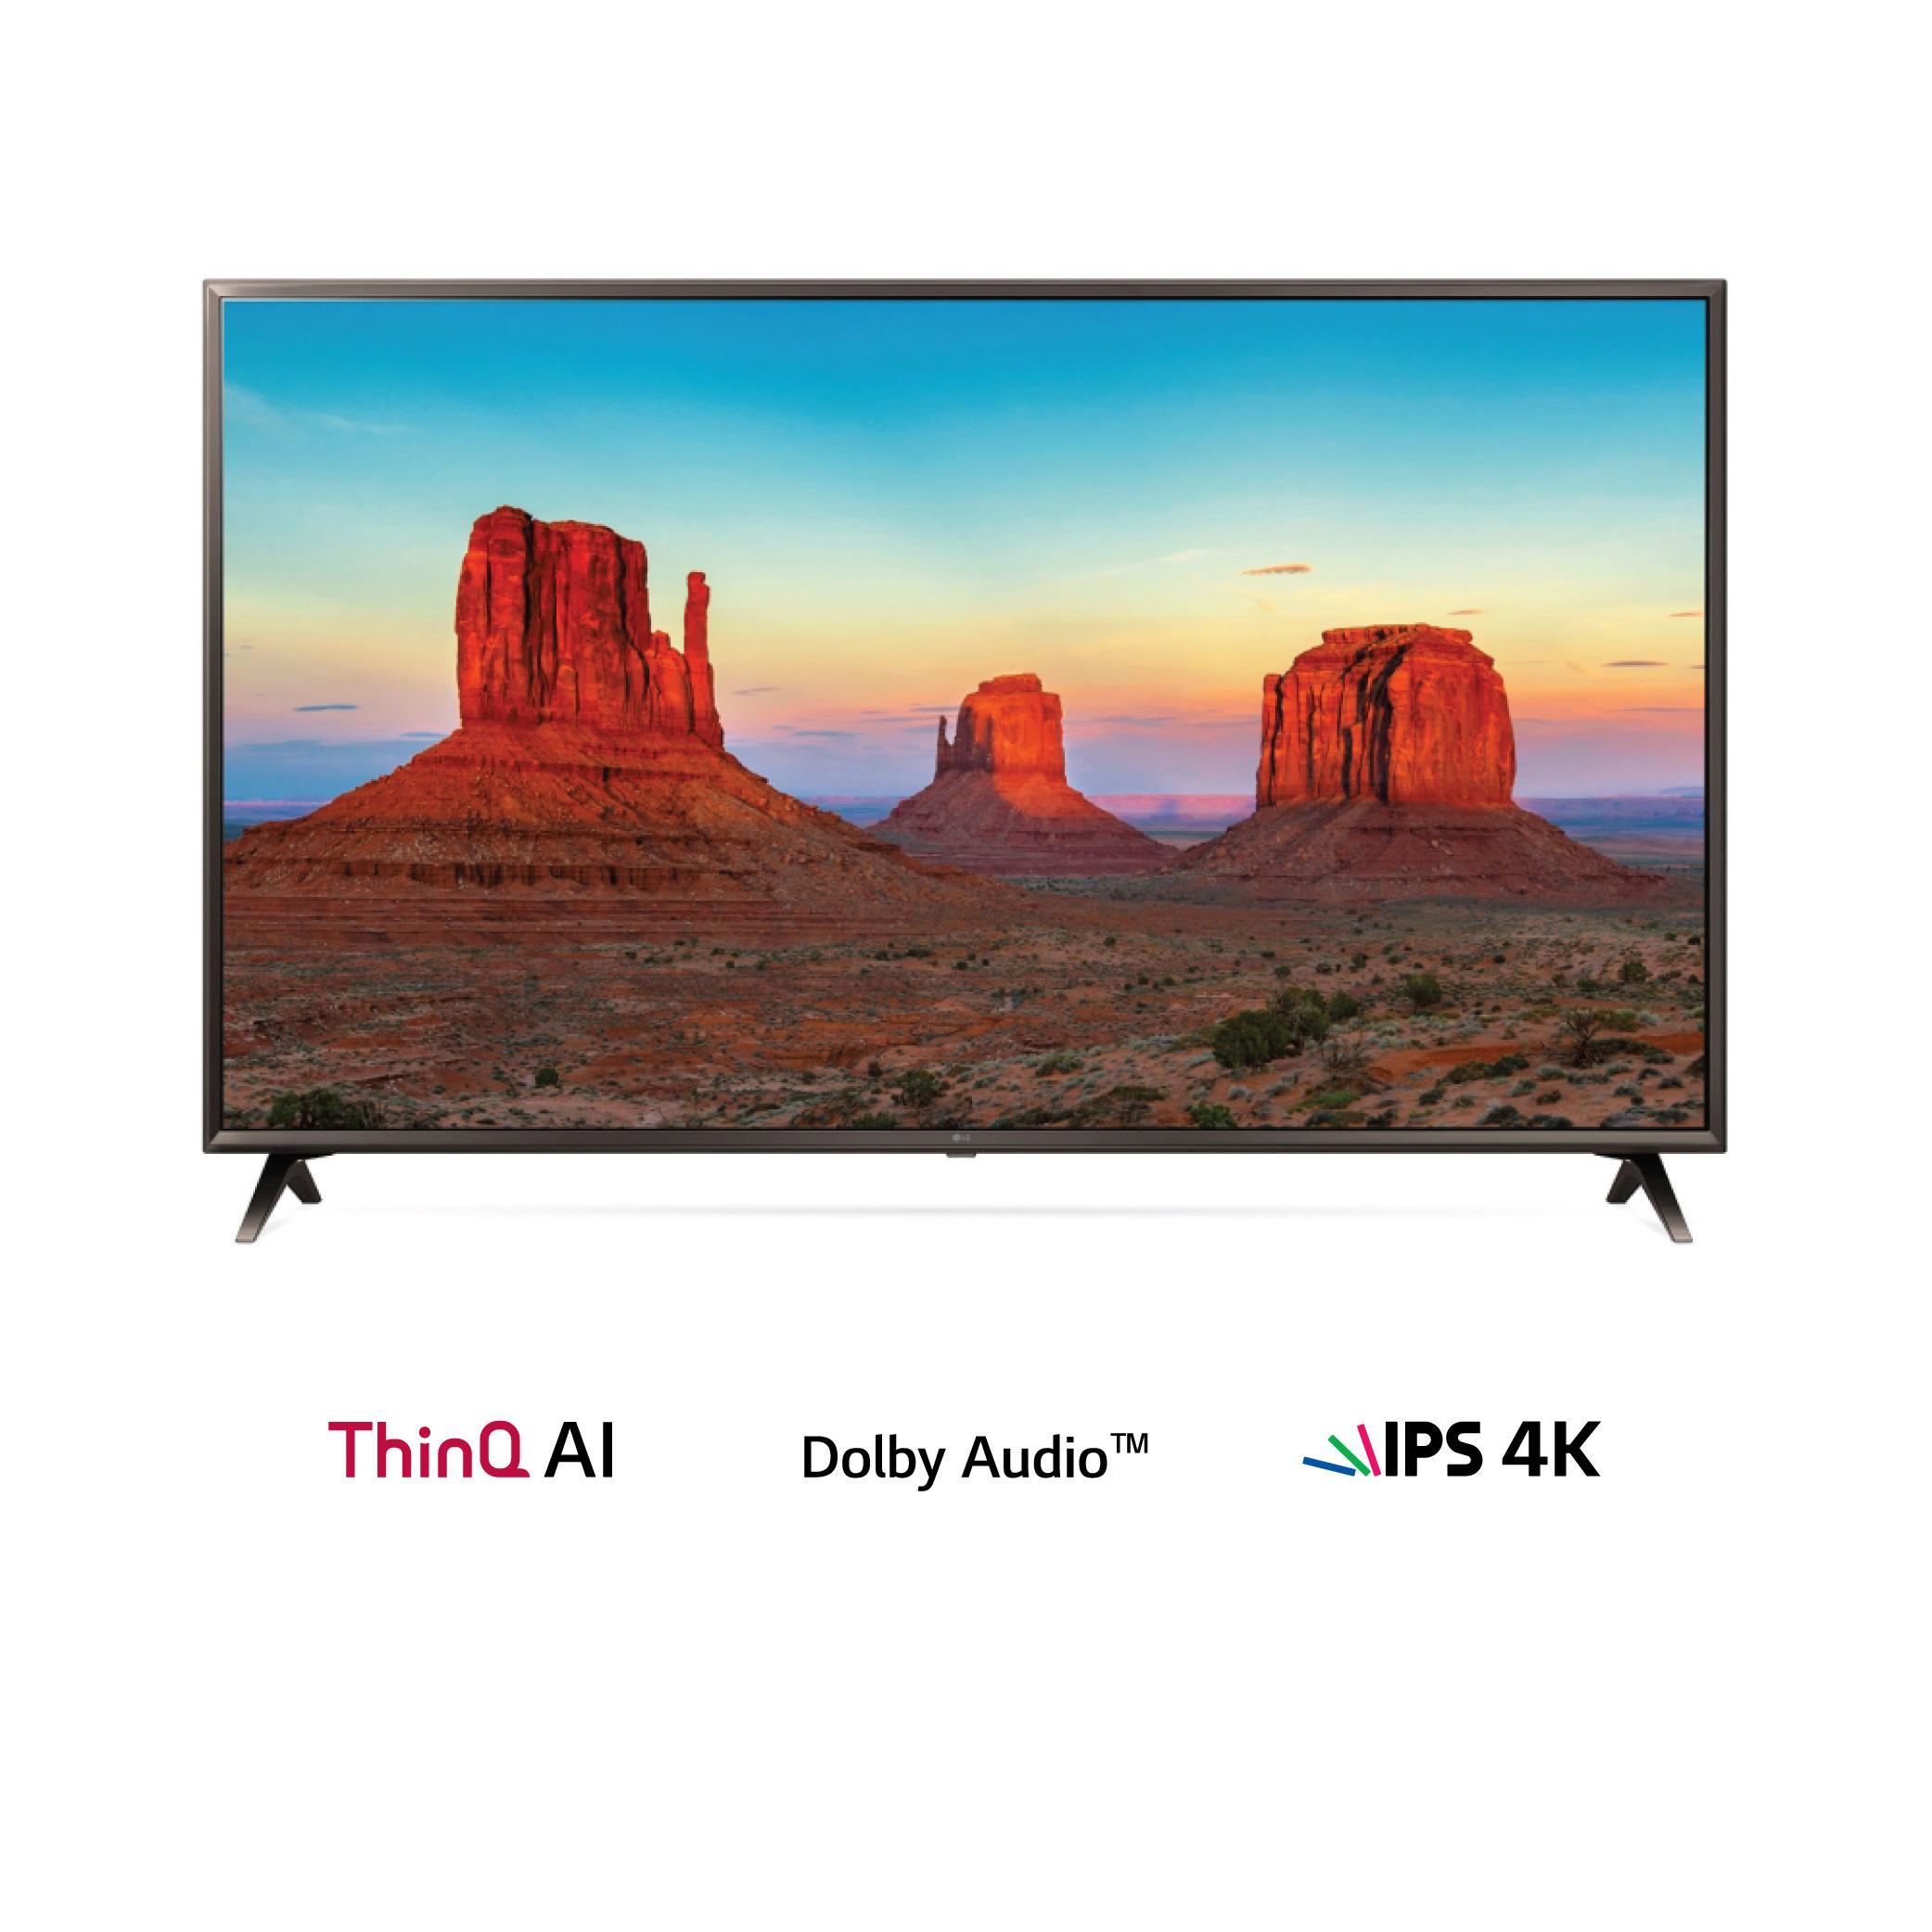 LG 43 inch Ultra HD TV - webOS 3.5 43UK6300PTE